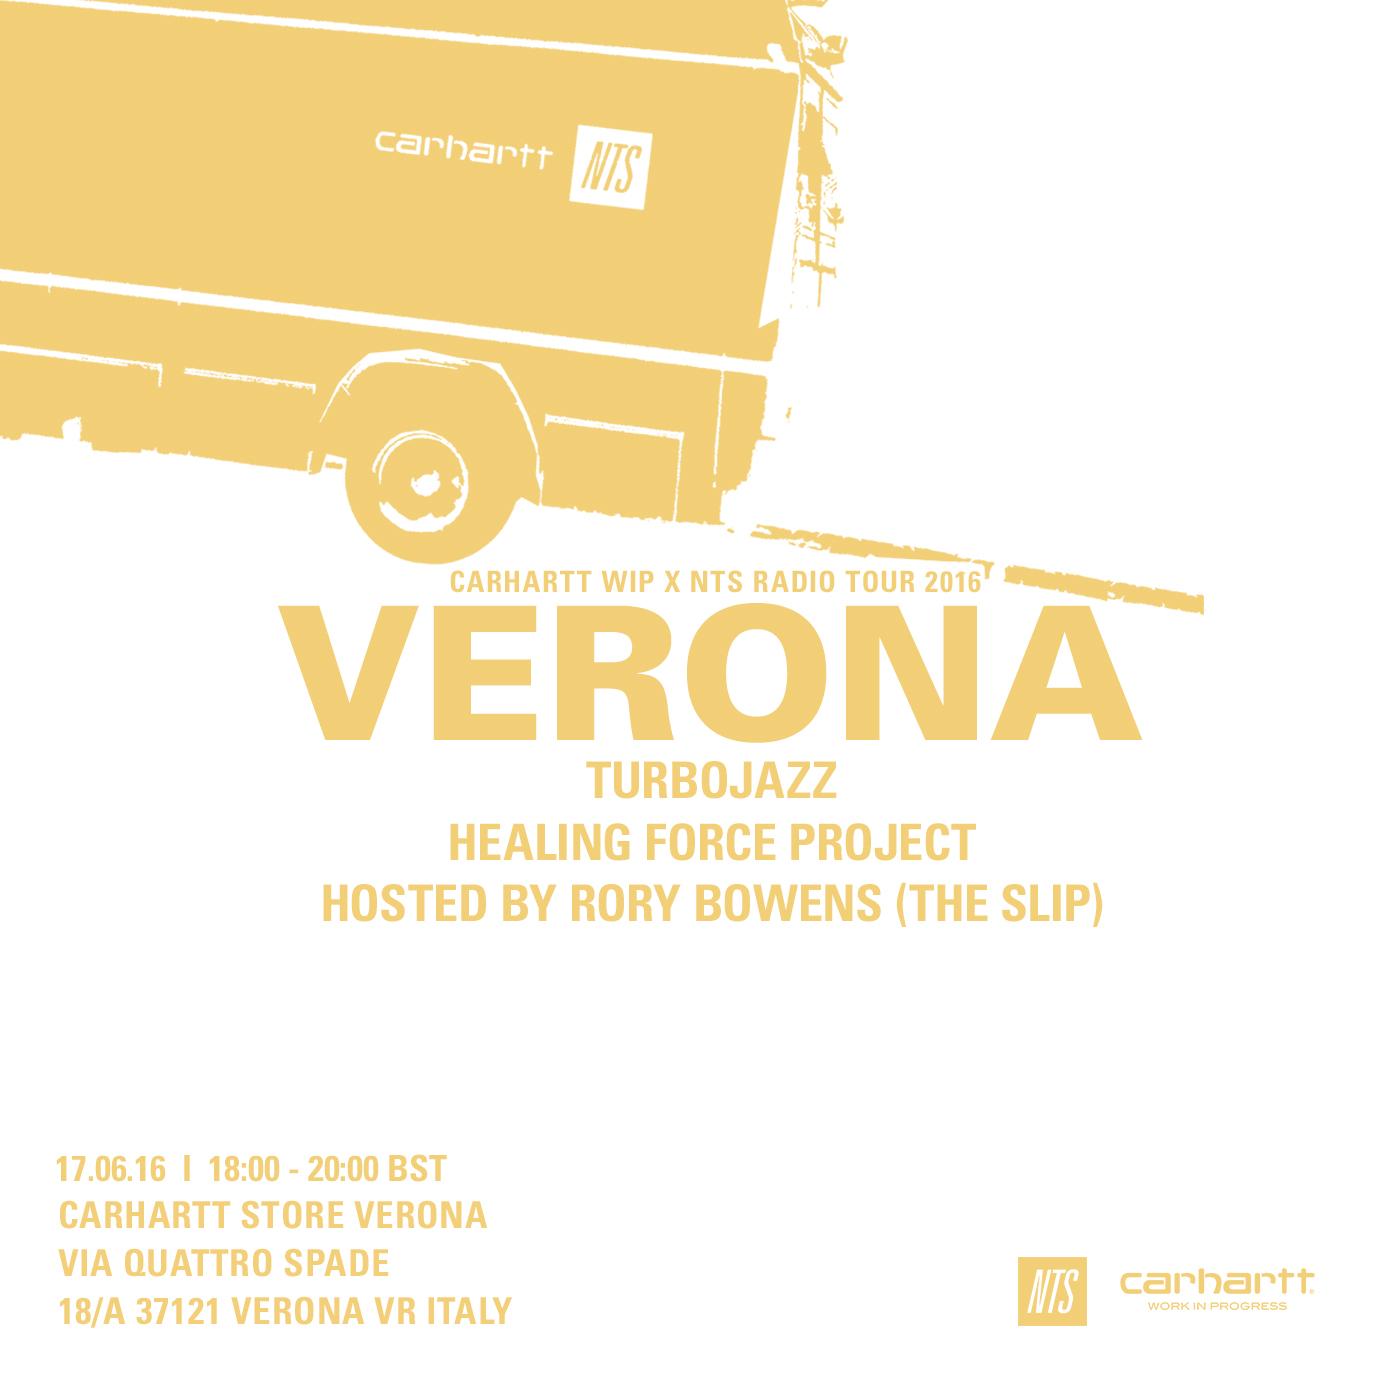 Verona-Instagram-Poster (2).jpg